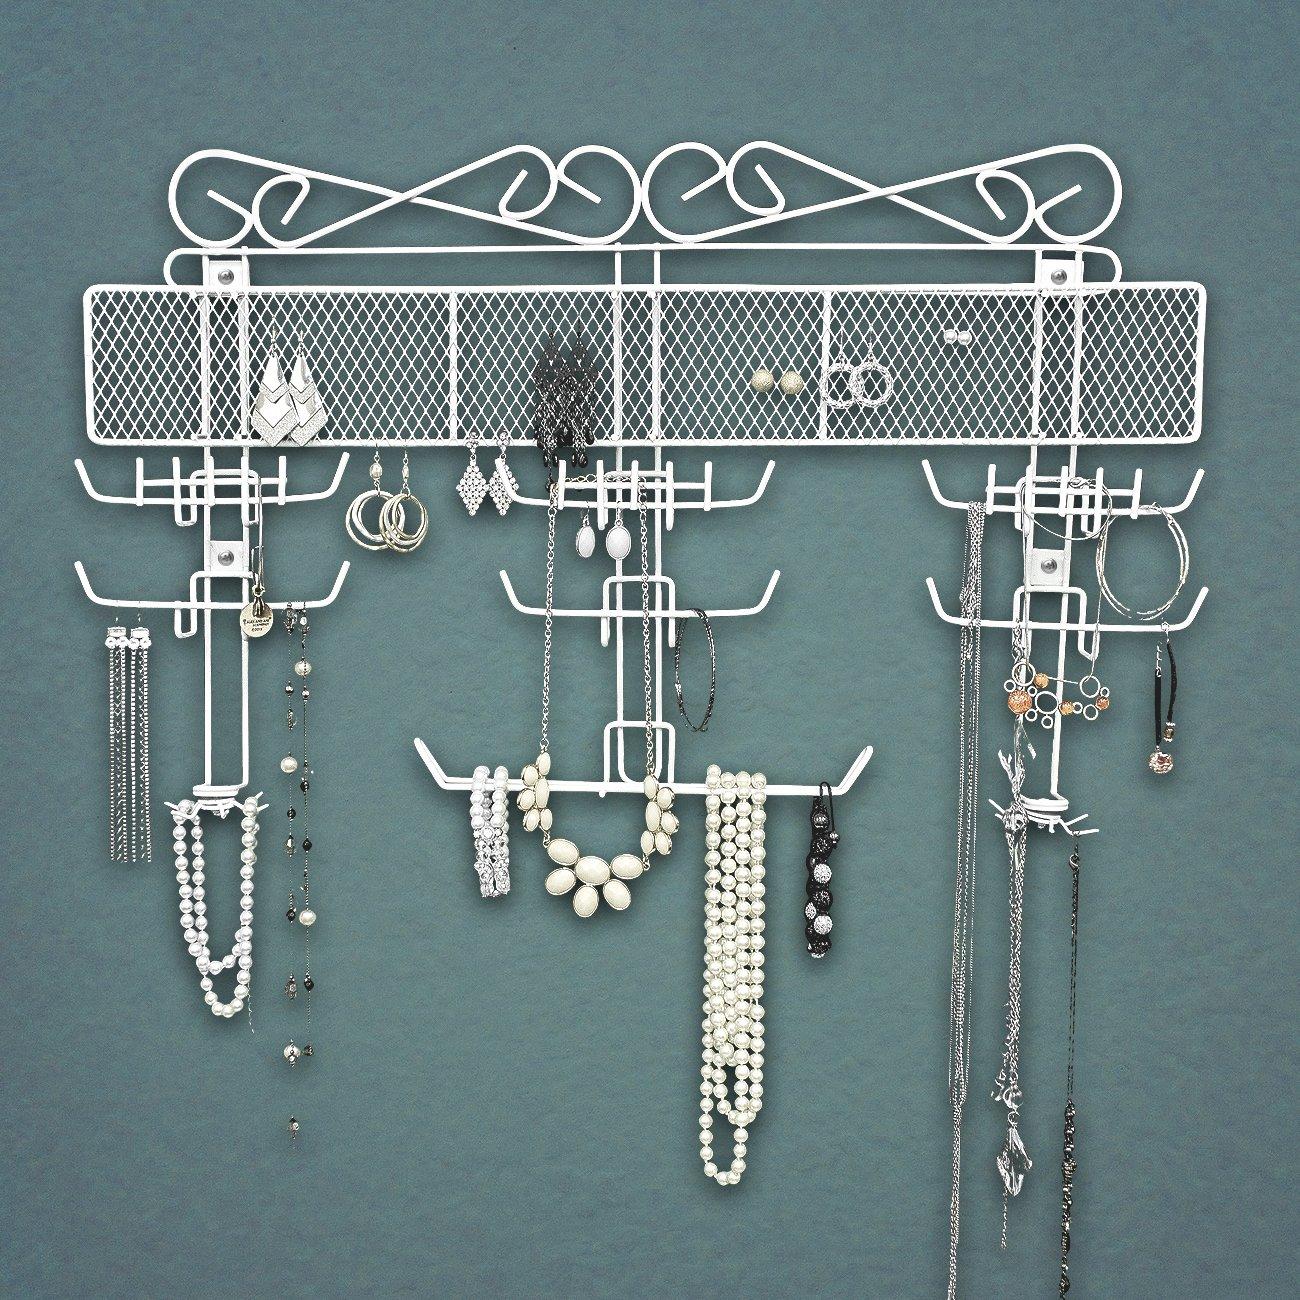 Amazoncom Sorbus Jewelry Hanger Organizer Valet Great for